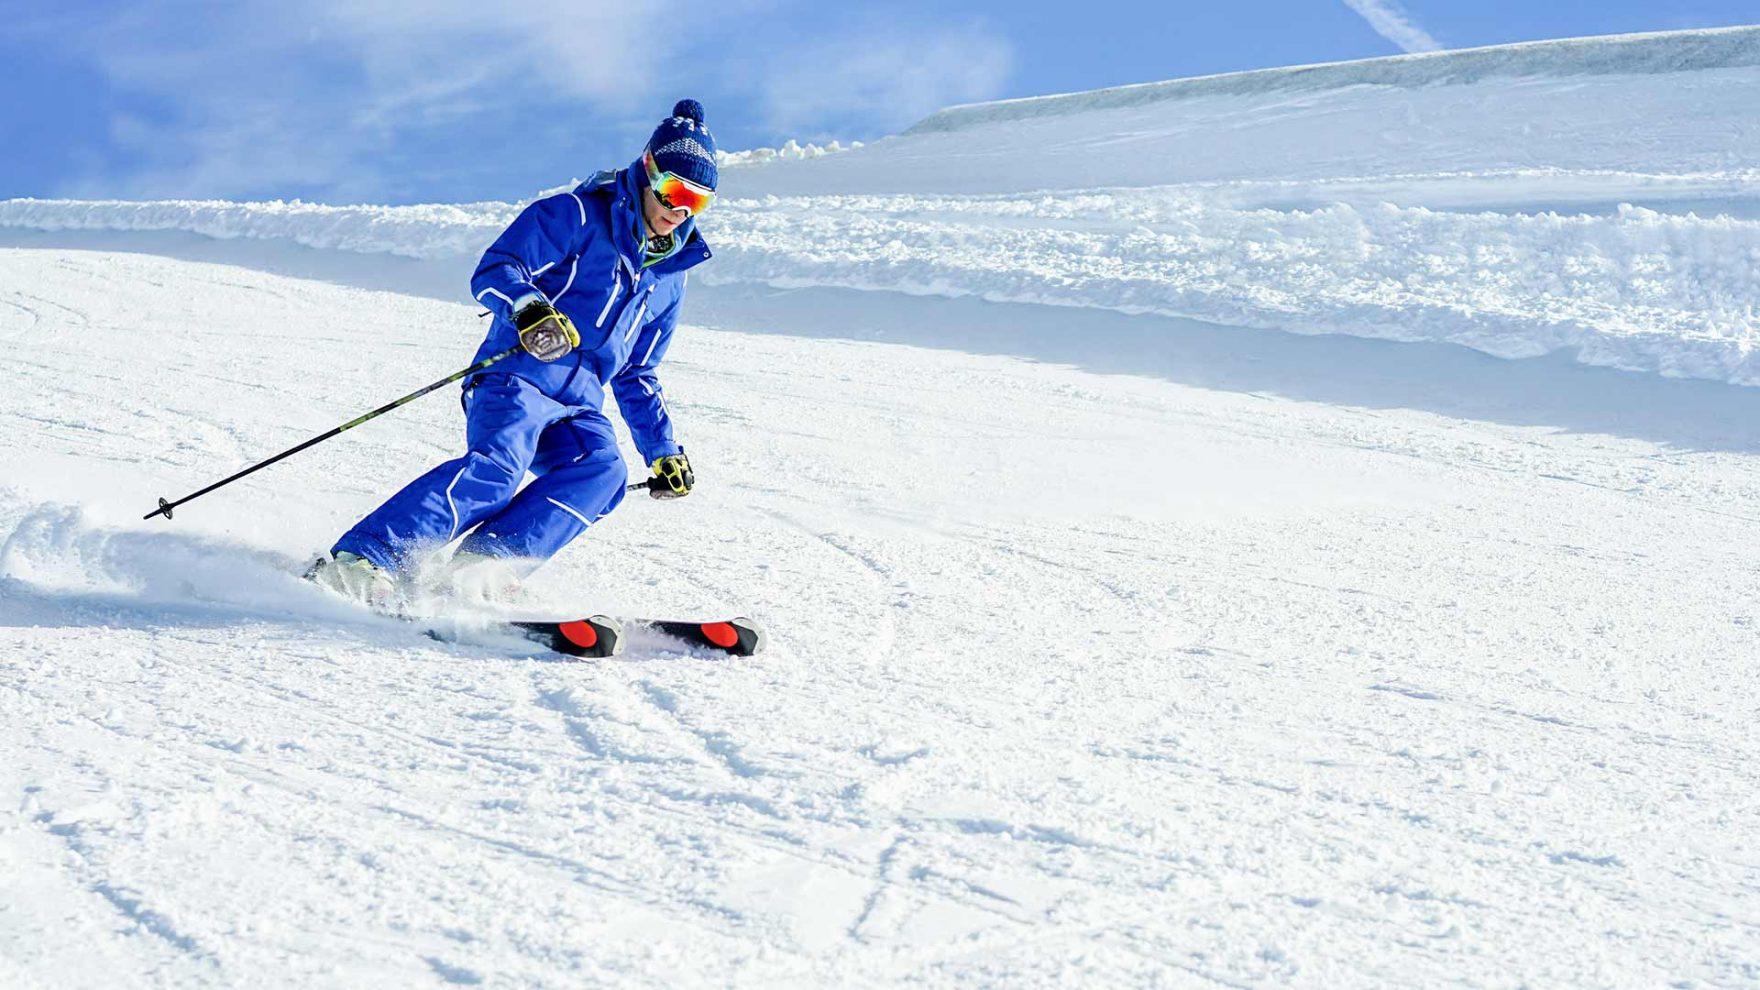 Skigebiet Meran 2000 - Skiurlaub